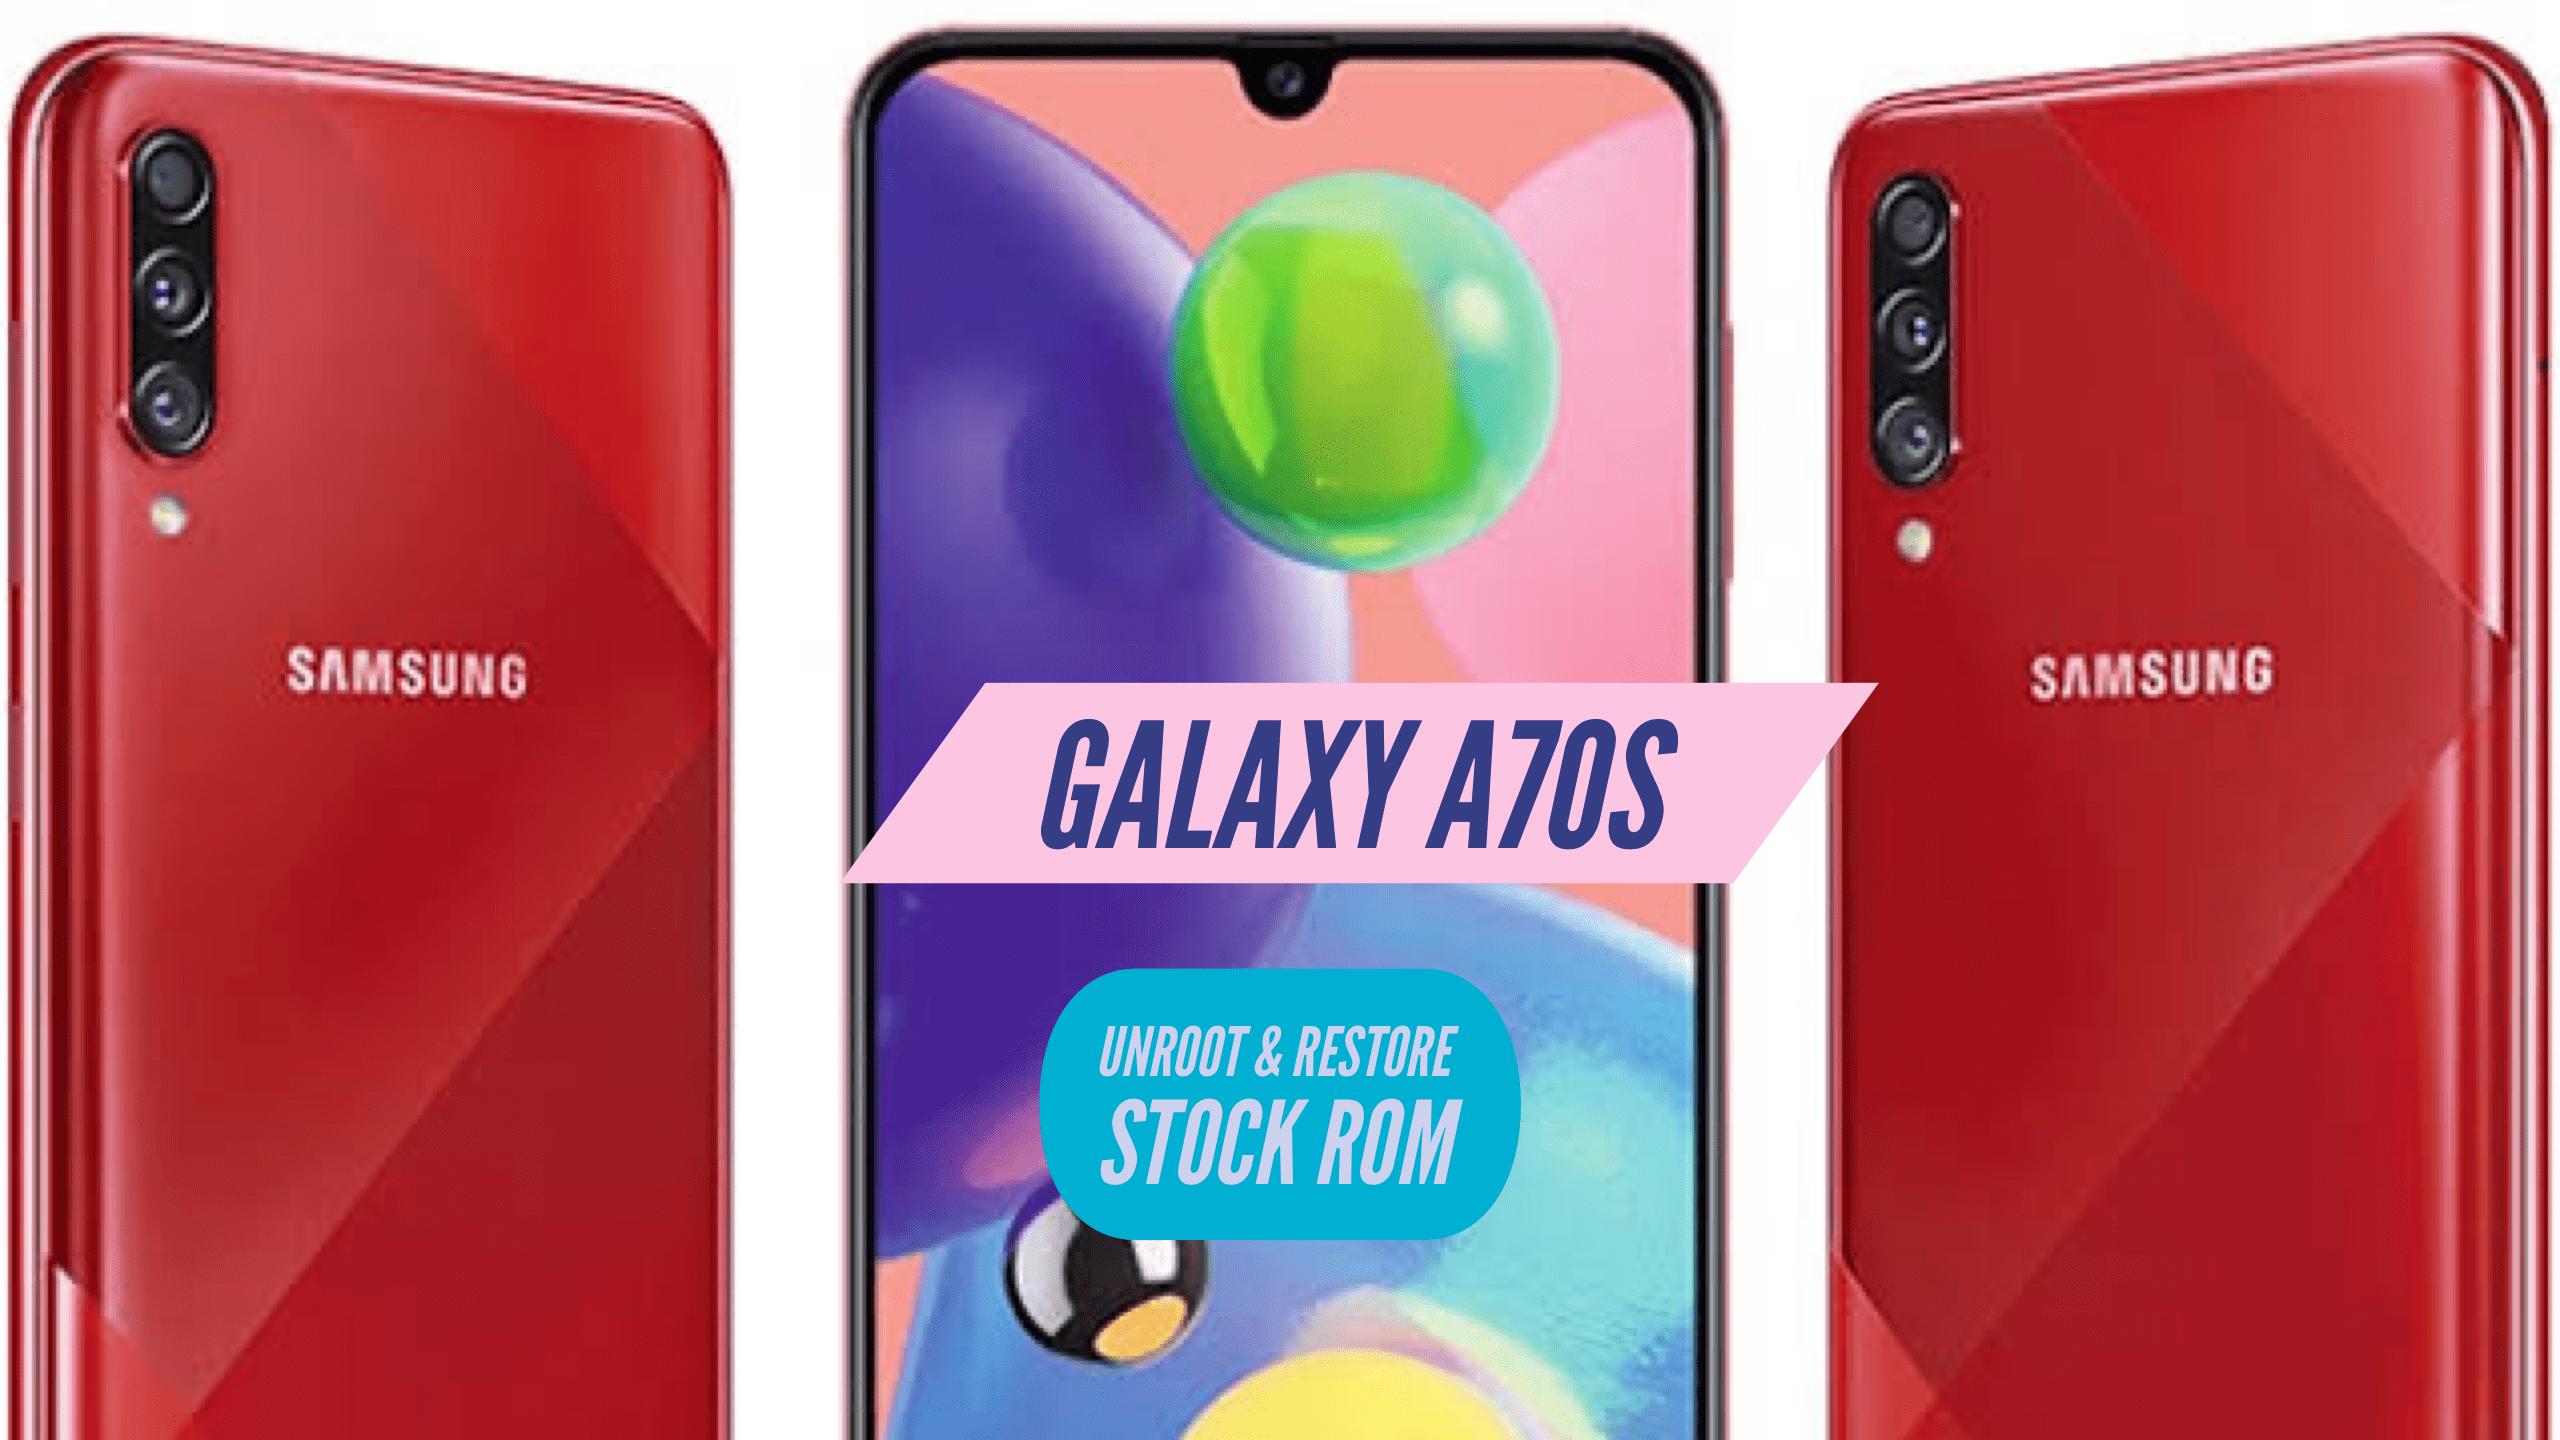 Unroot Galaxy A70s Restore Stock ROM